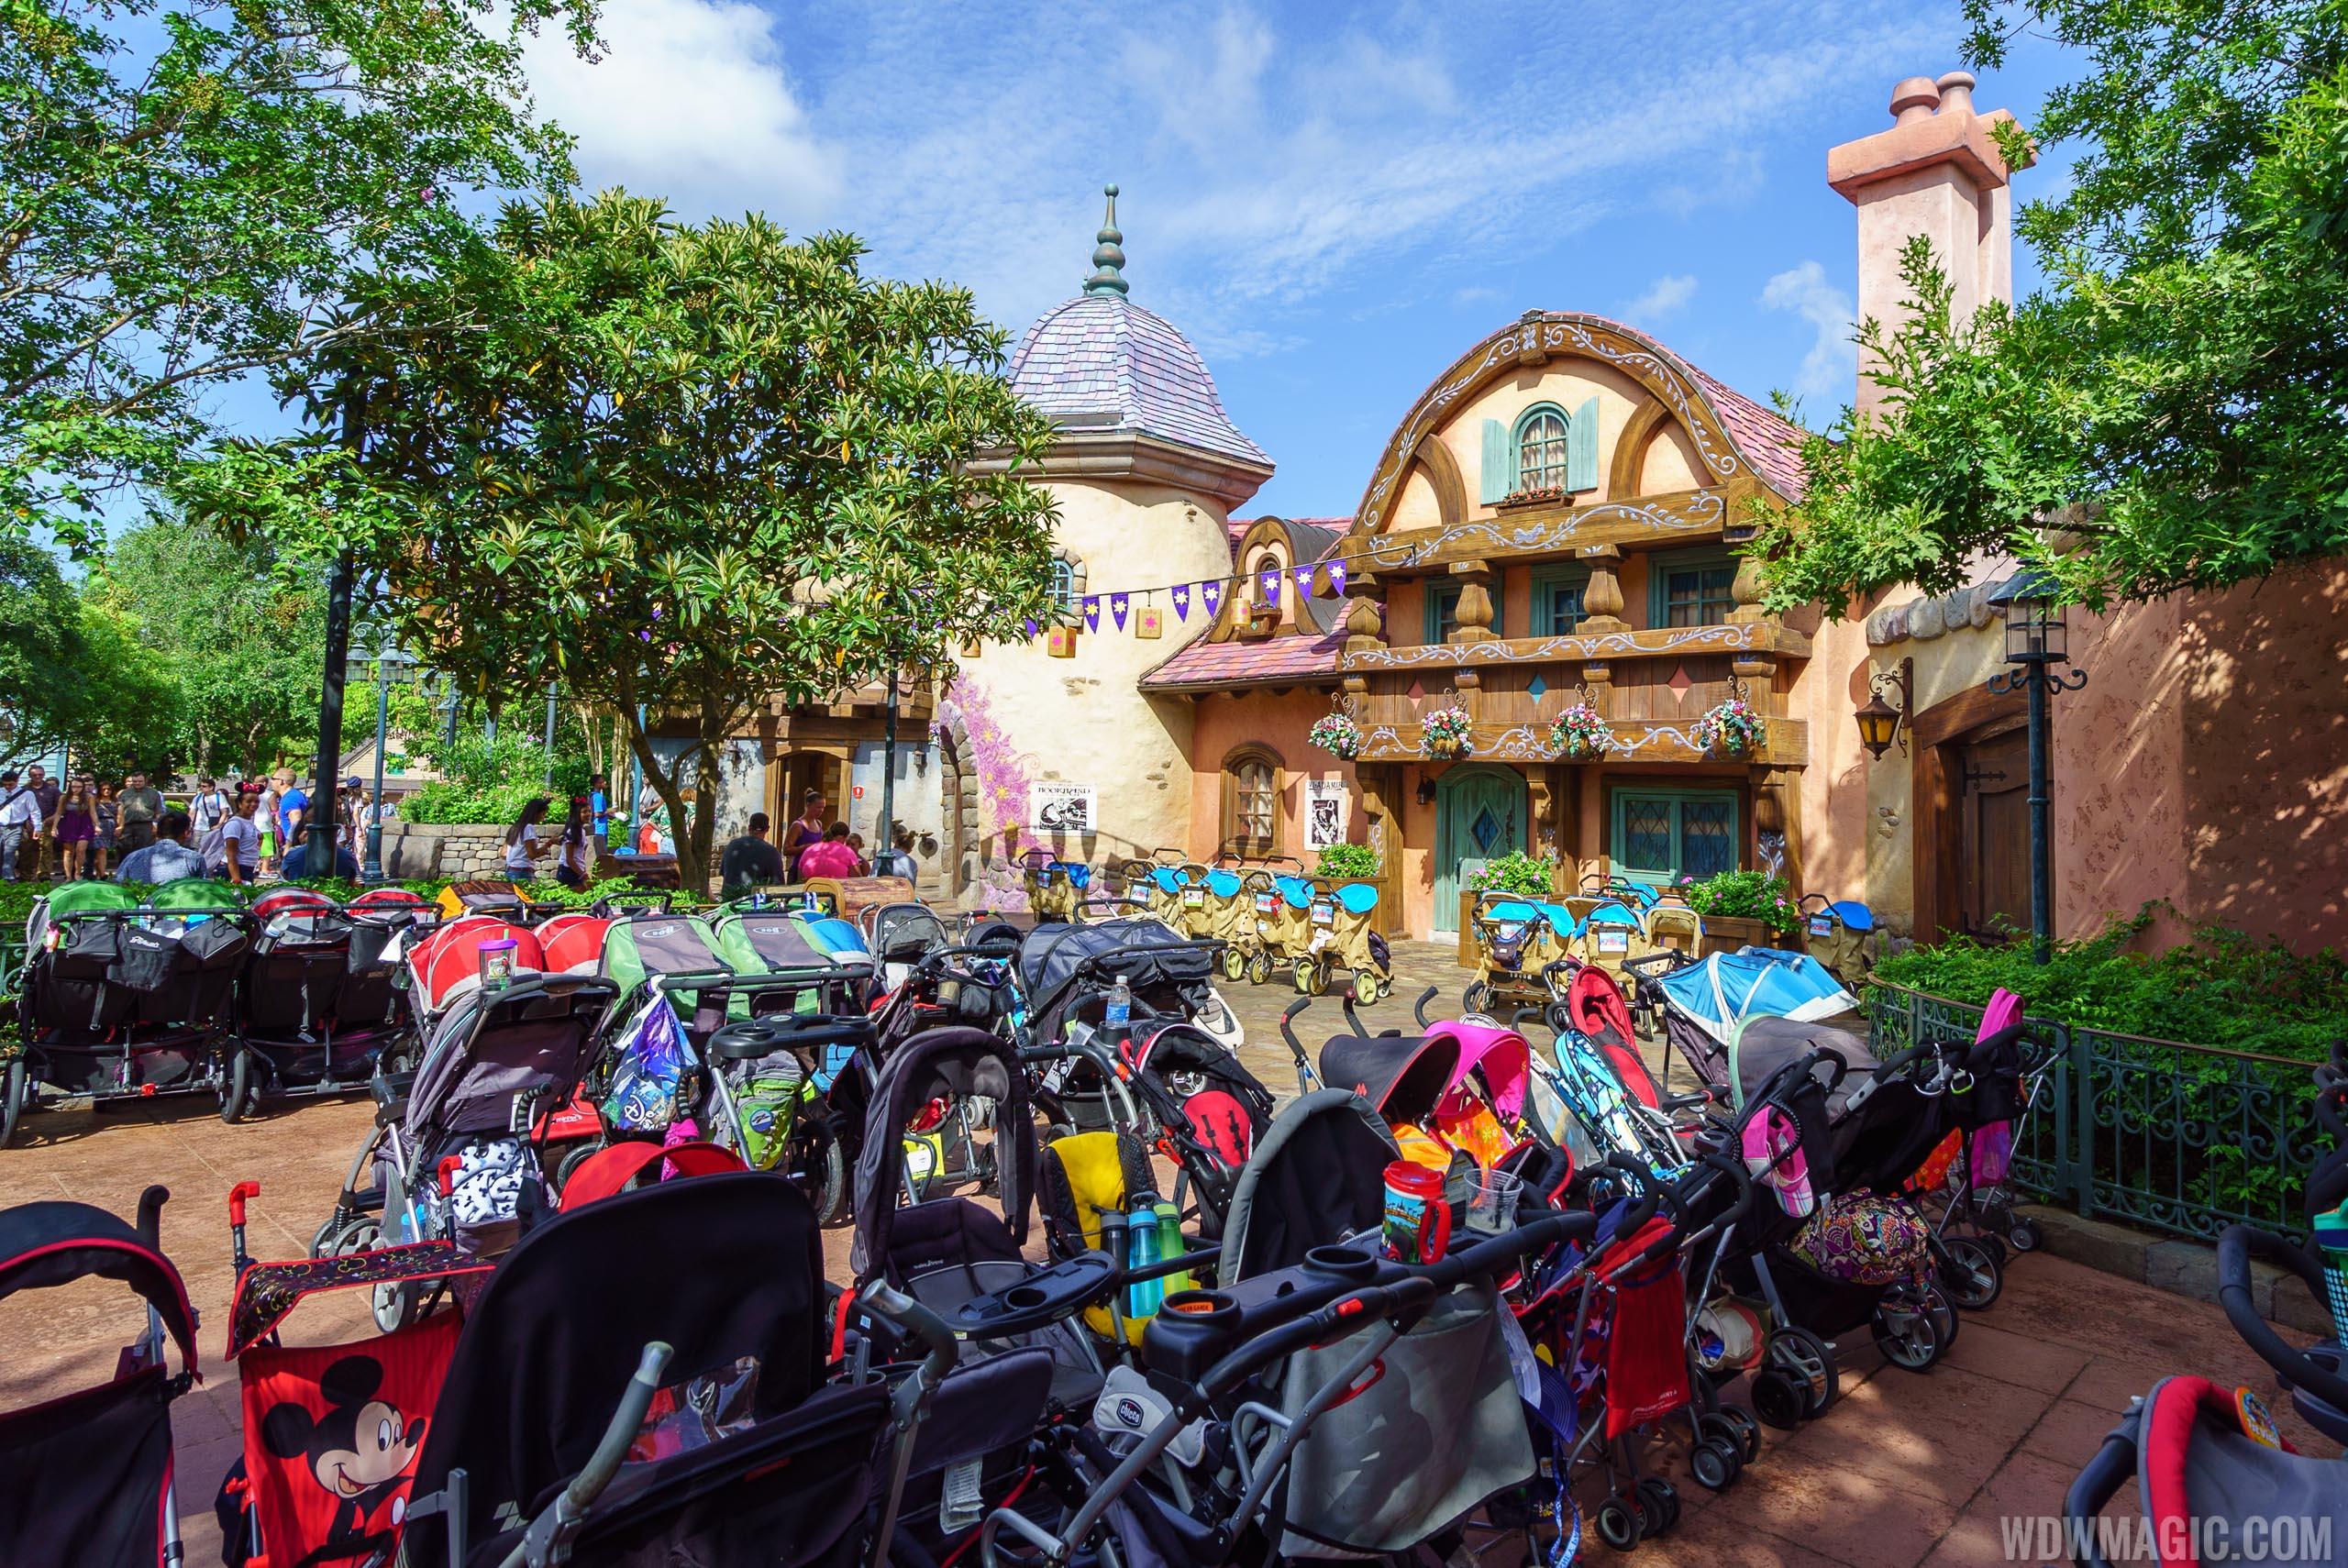 Strollers at the Magic Kingdom